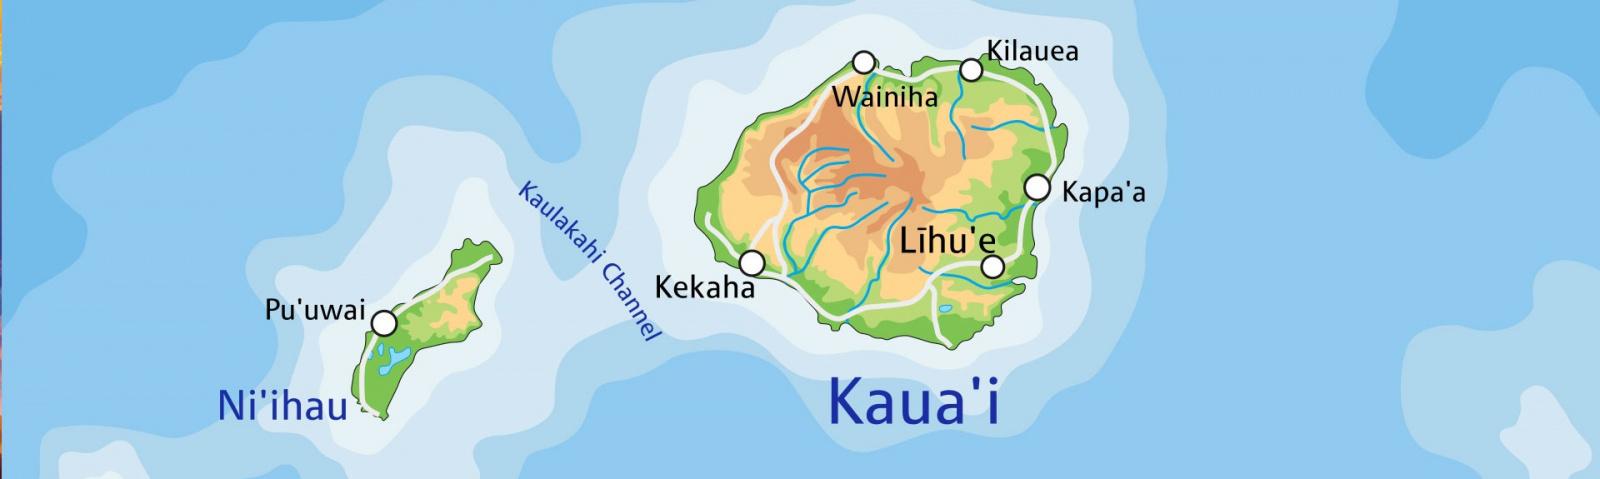 Kauai Maps on